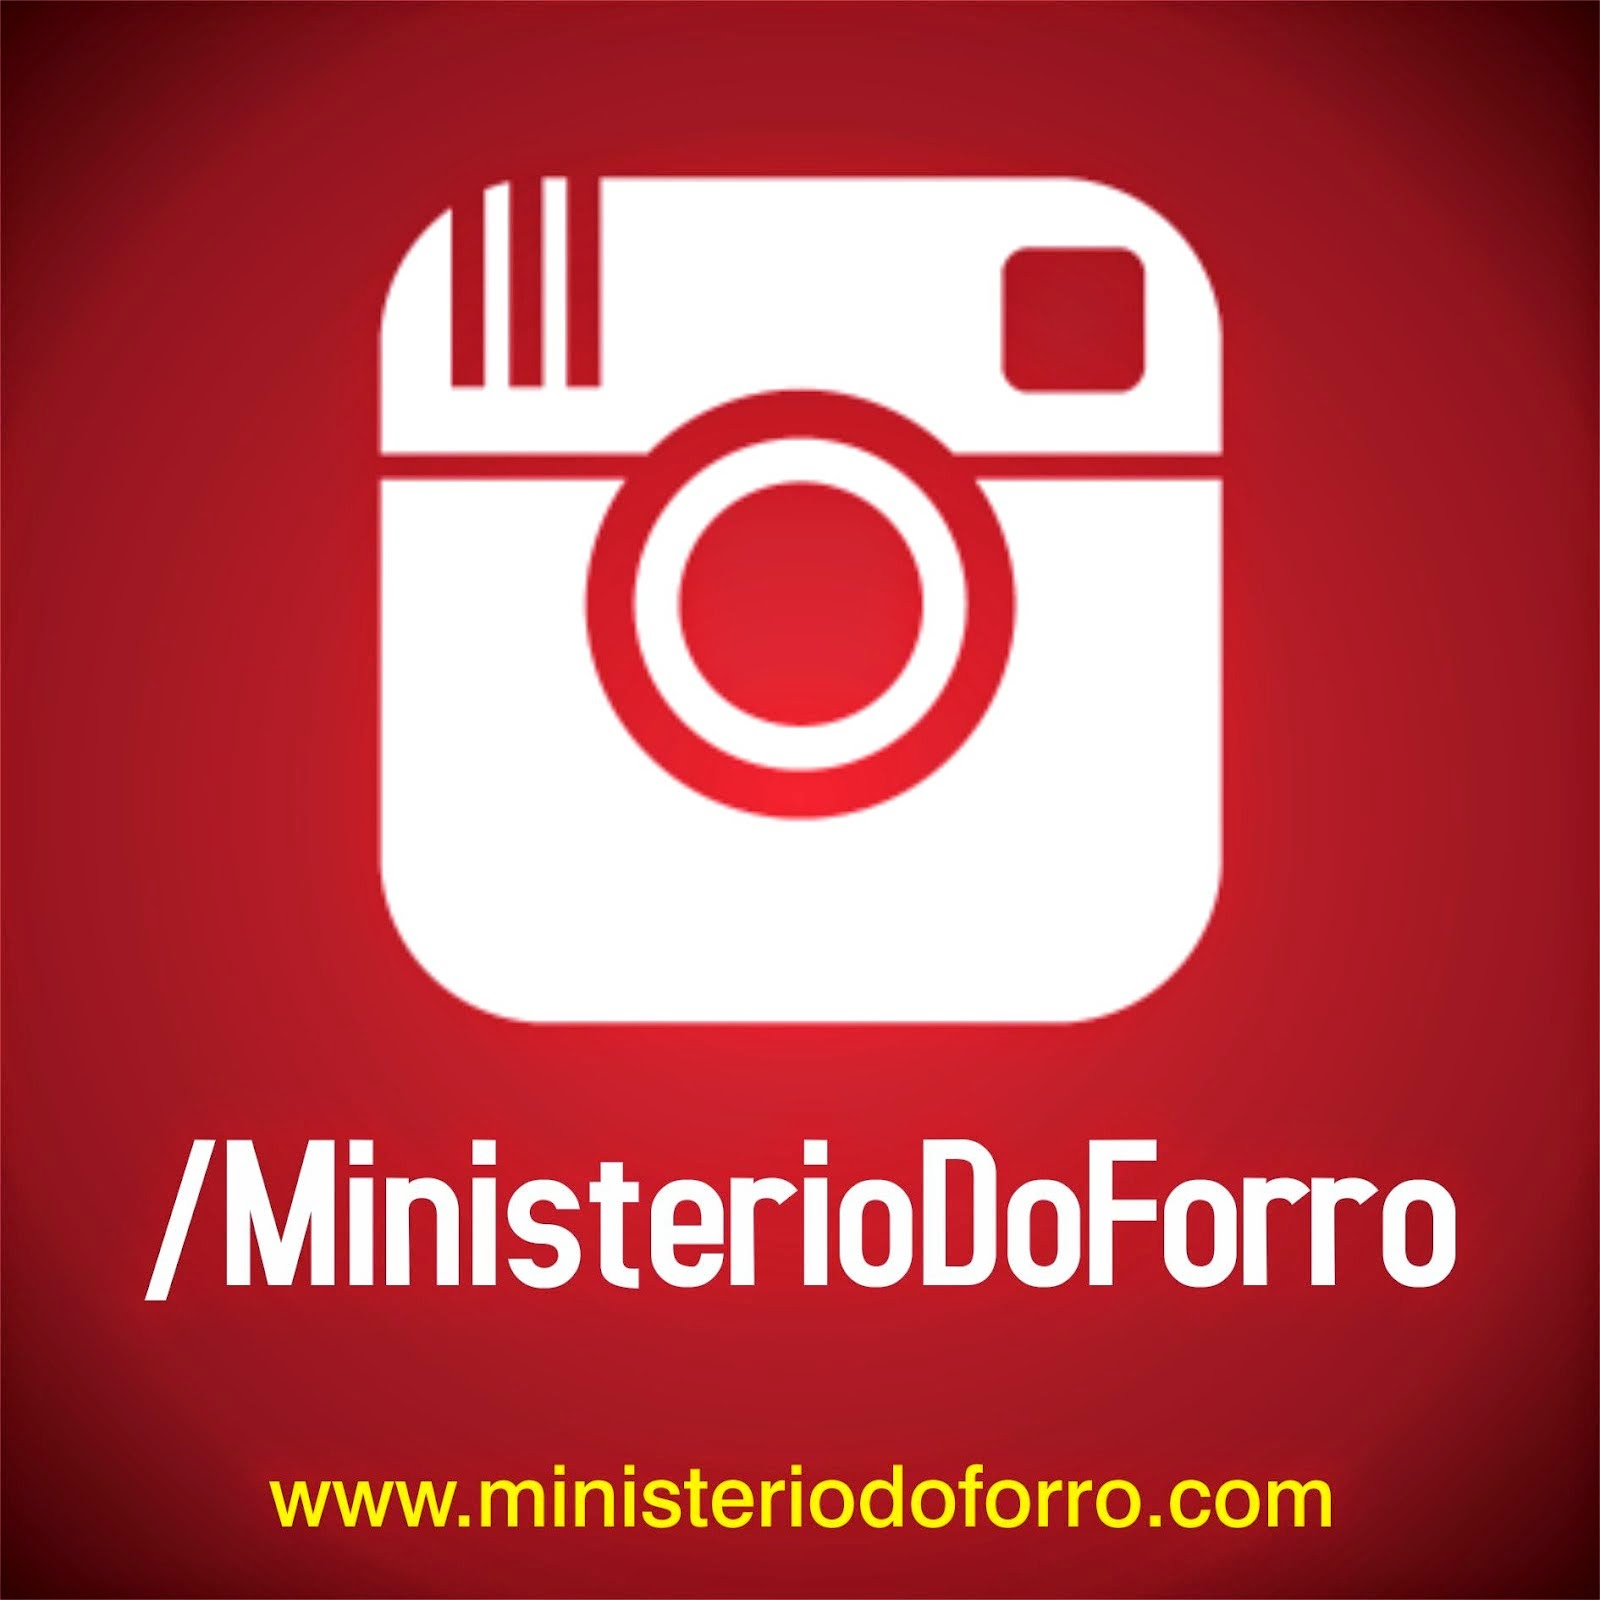 Instagram OFicial